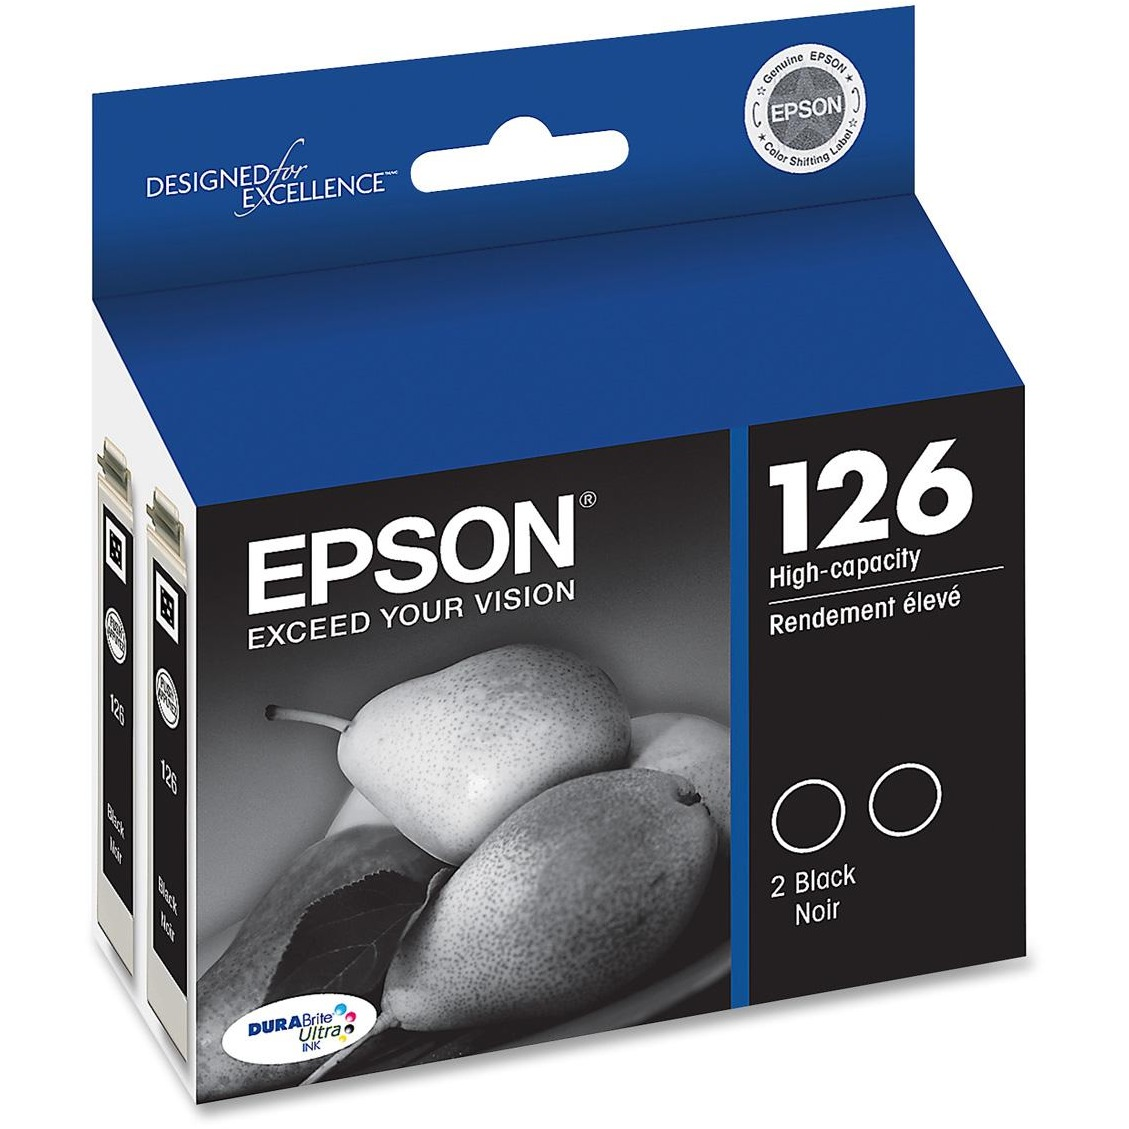 Epson DURABrite 126 Original Dual Black Ink Cartridge by Epson